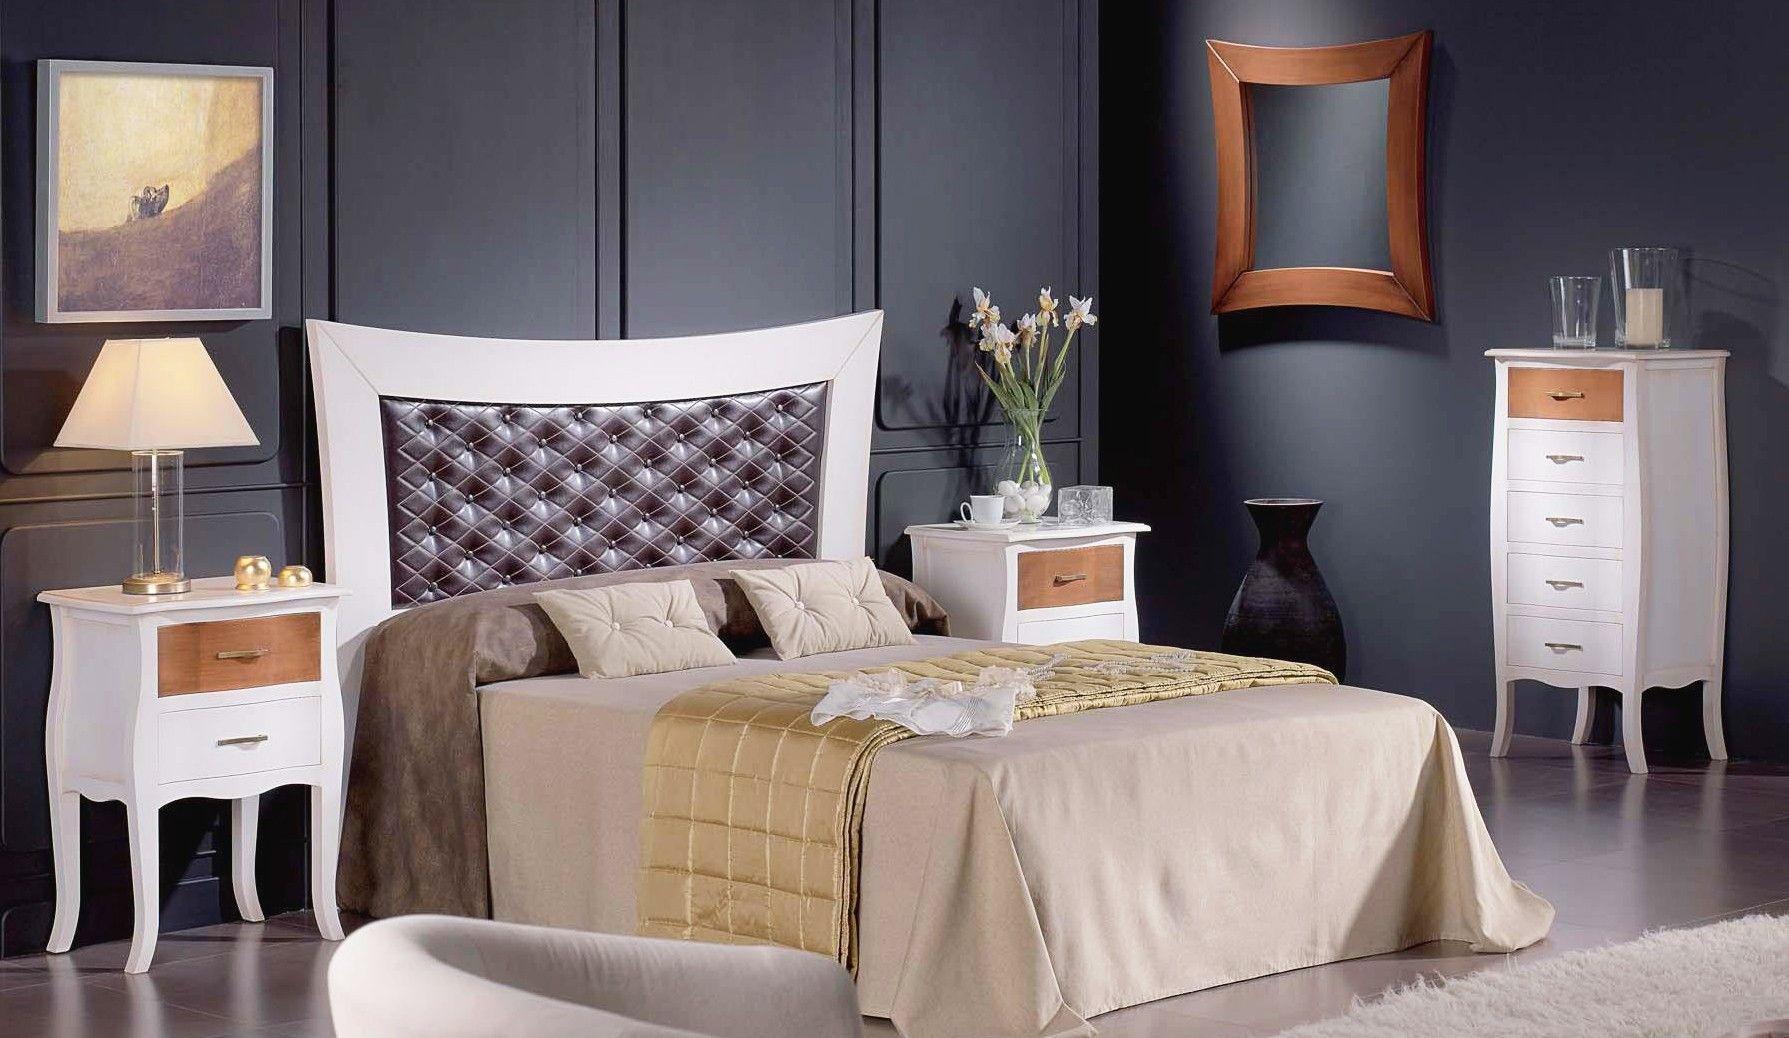 Matrimonio Bed Info : Dormitorio de matrimonio madera y polipiel pino